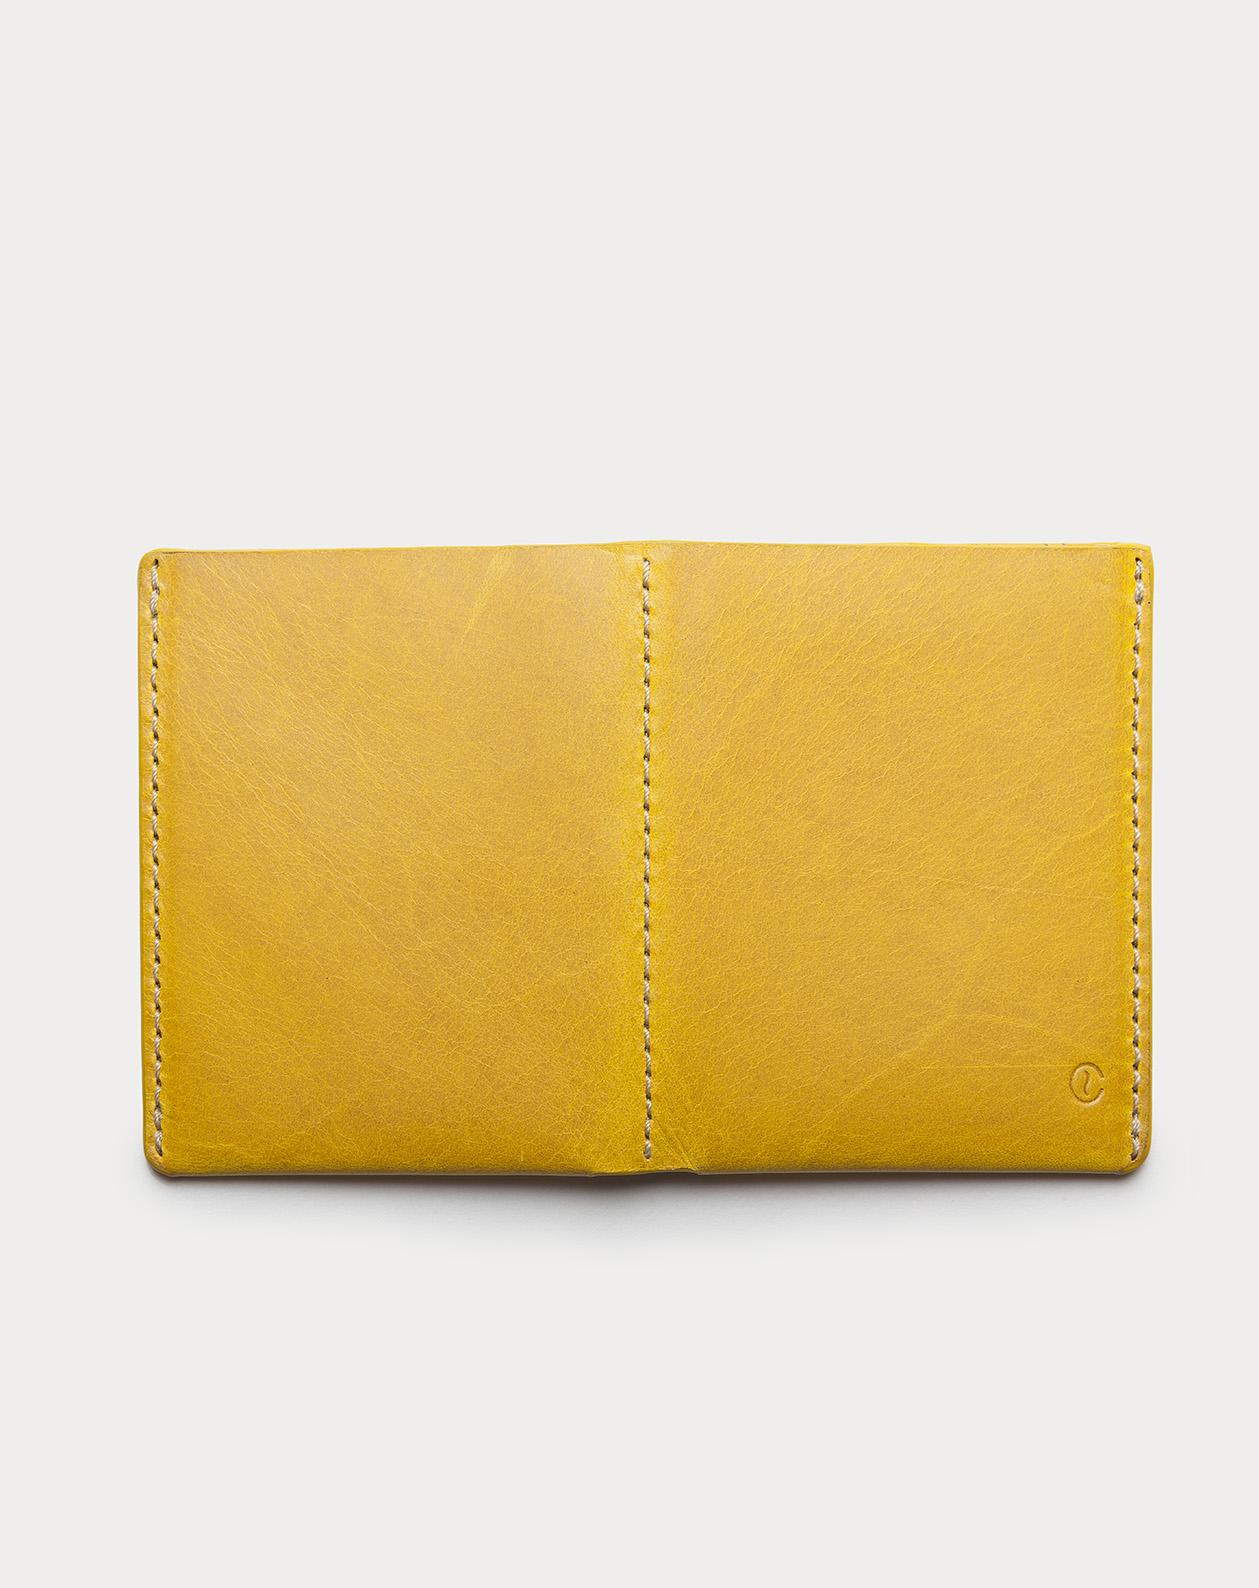 Ultra Slim Leather Wallet Jamaica Honey Mustard 2